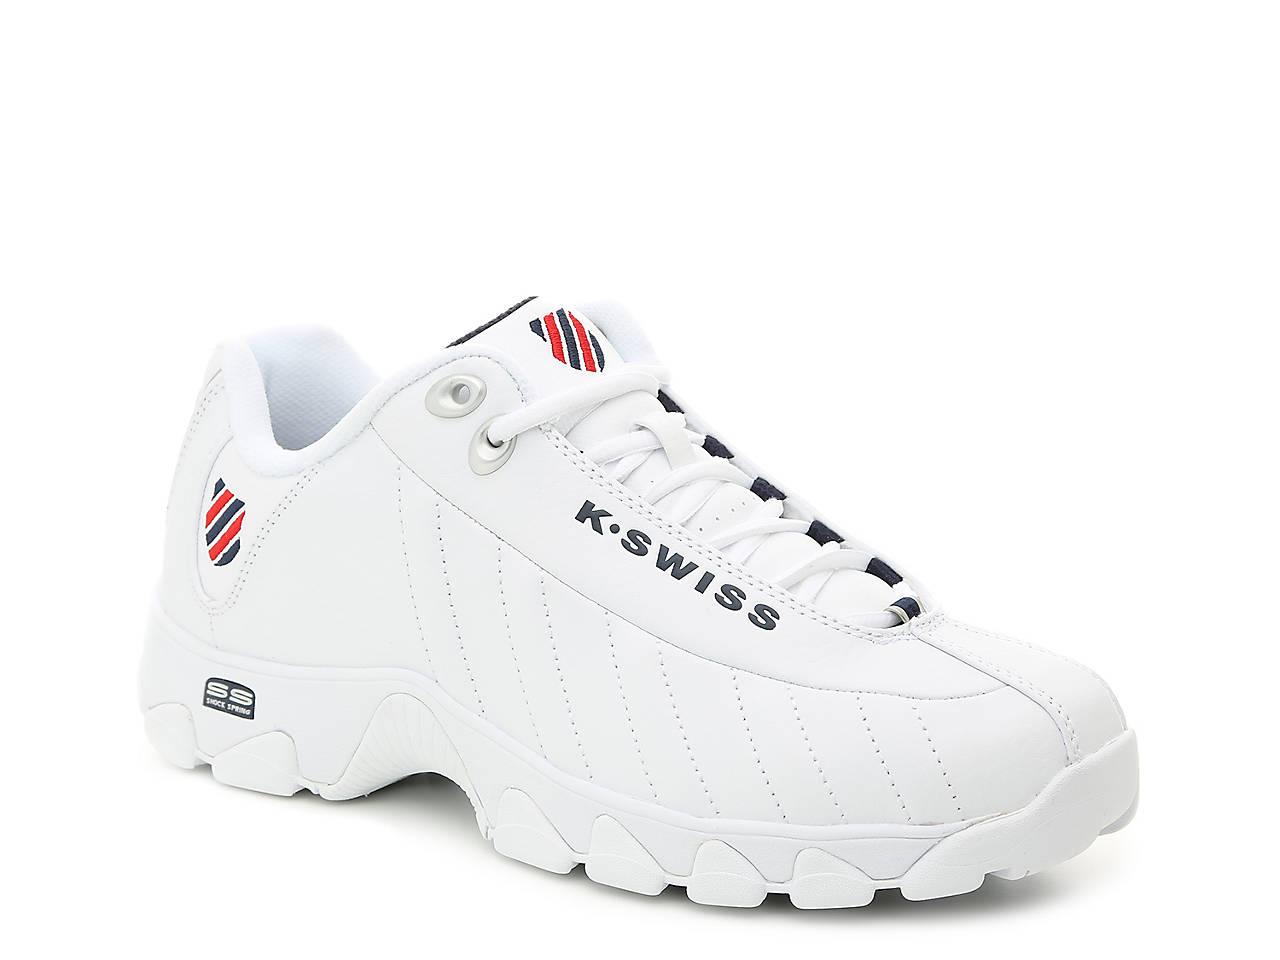 5d4668cc8e9d K-Swiss ST329 CMF Sneaker - Men s Men s Shoes